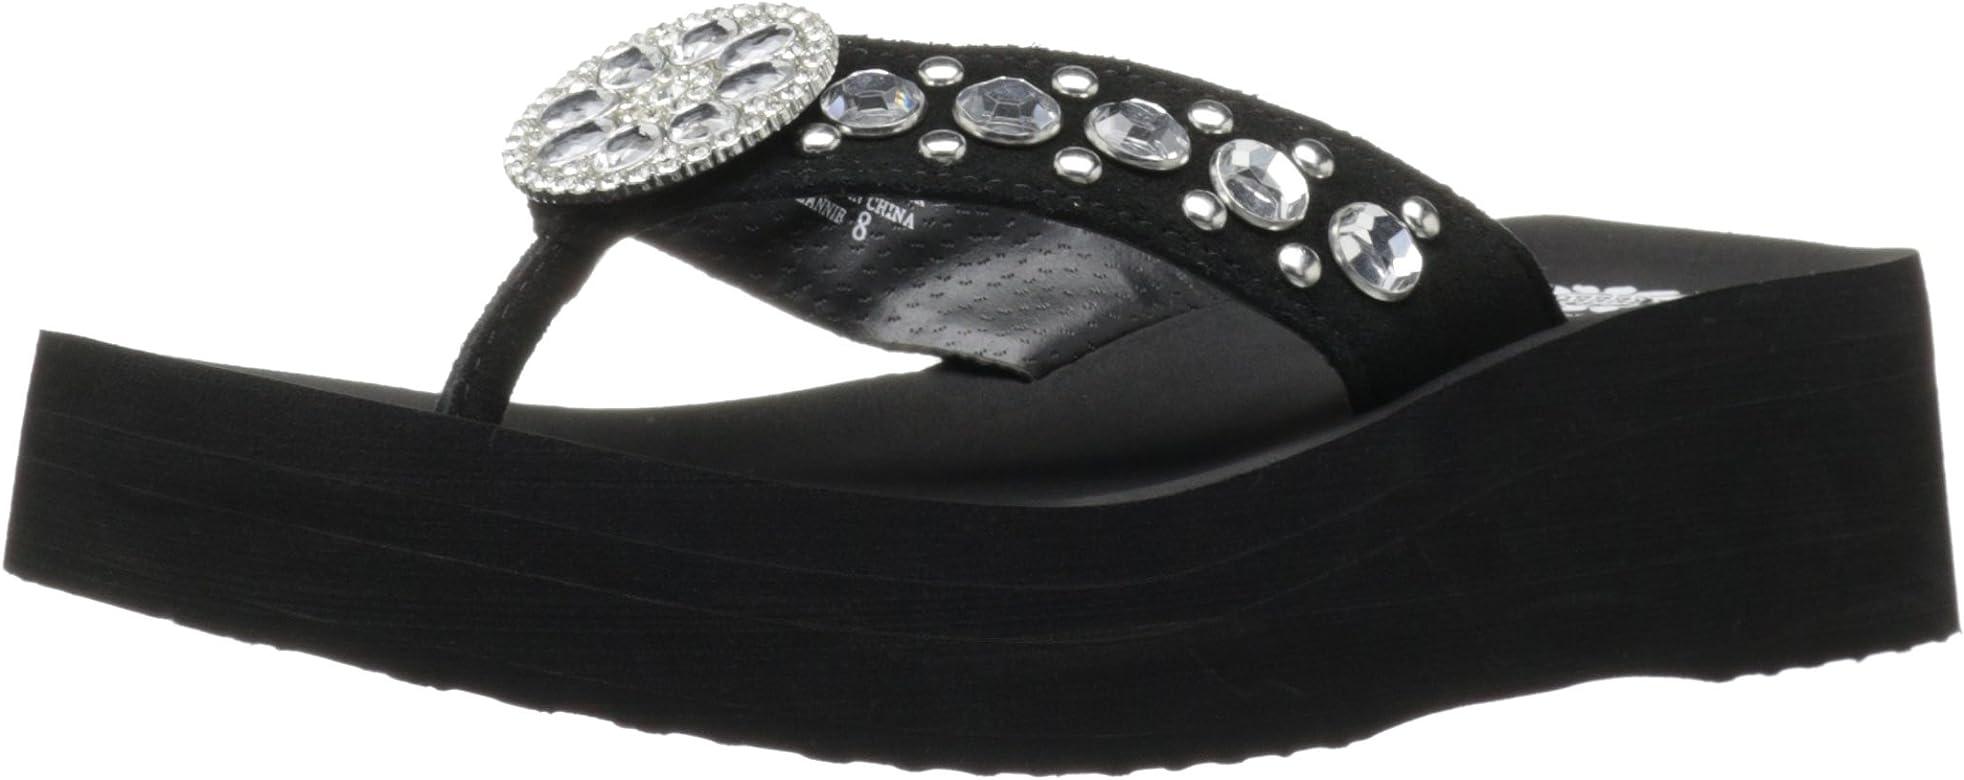 Black Choose SZ//color Yellow Box Women/'s Flax Wedge Sandal 6 M U